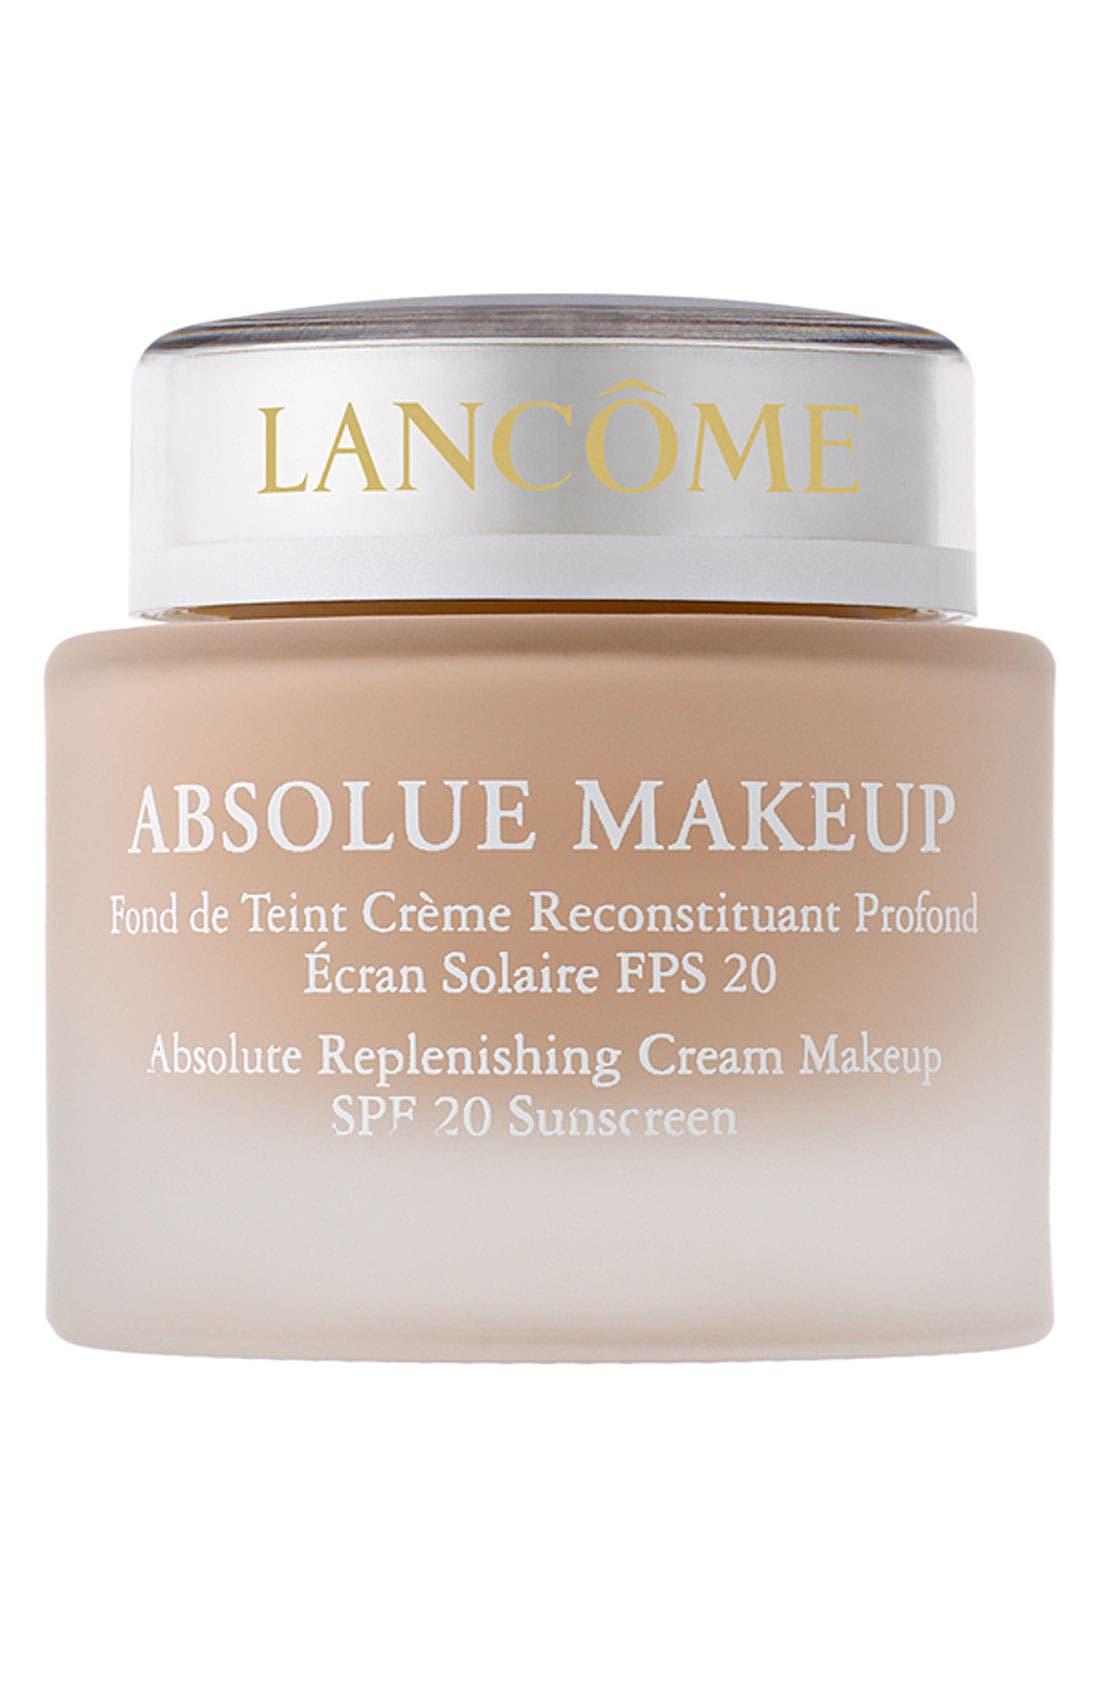 Lancôme Absolue Replenishing Cream Makeup SPF 20